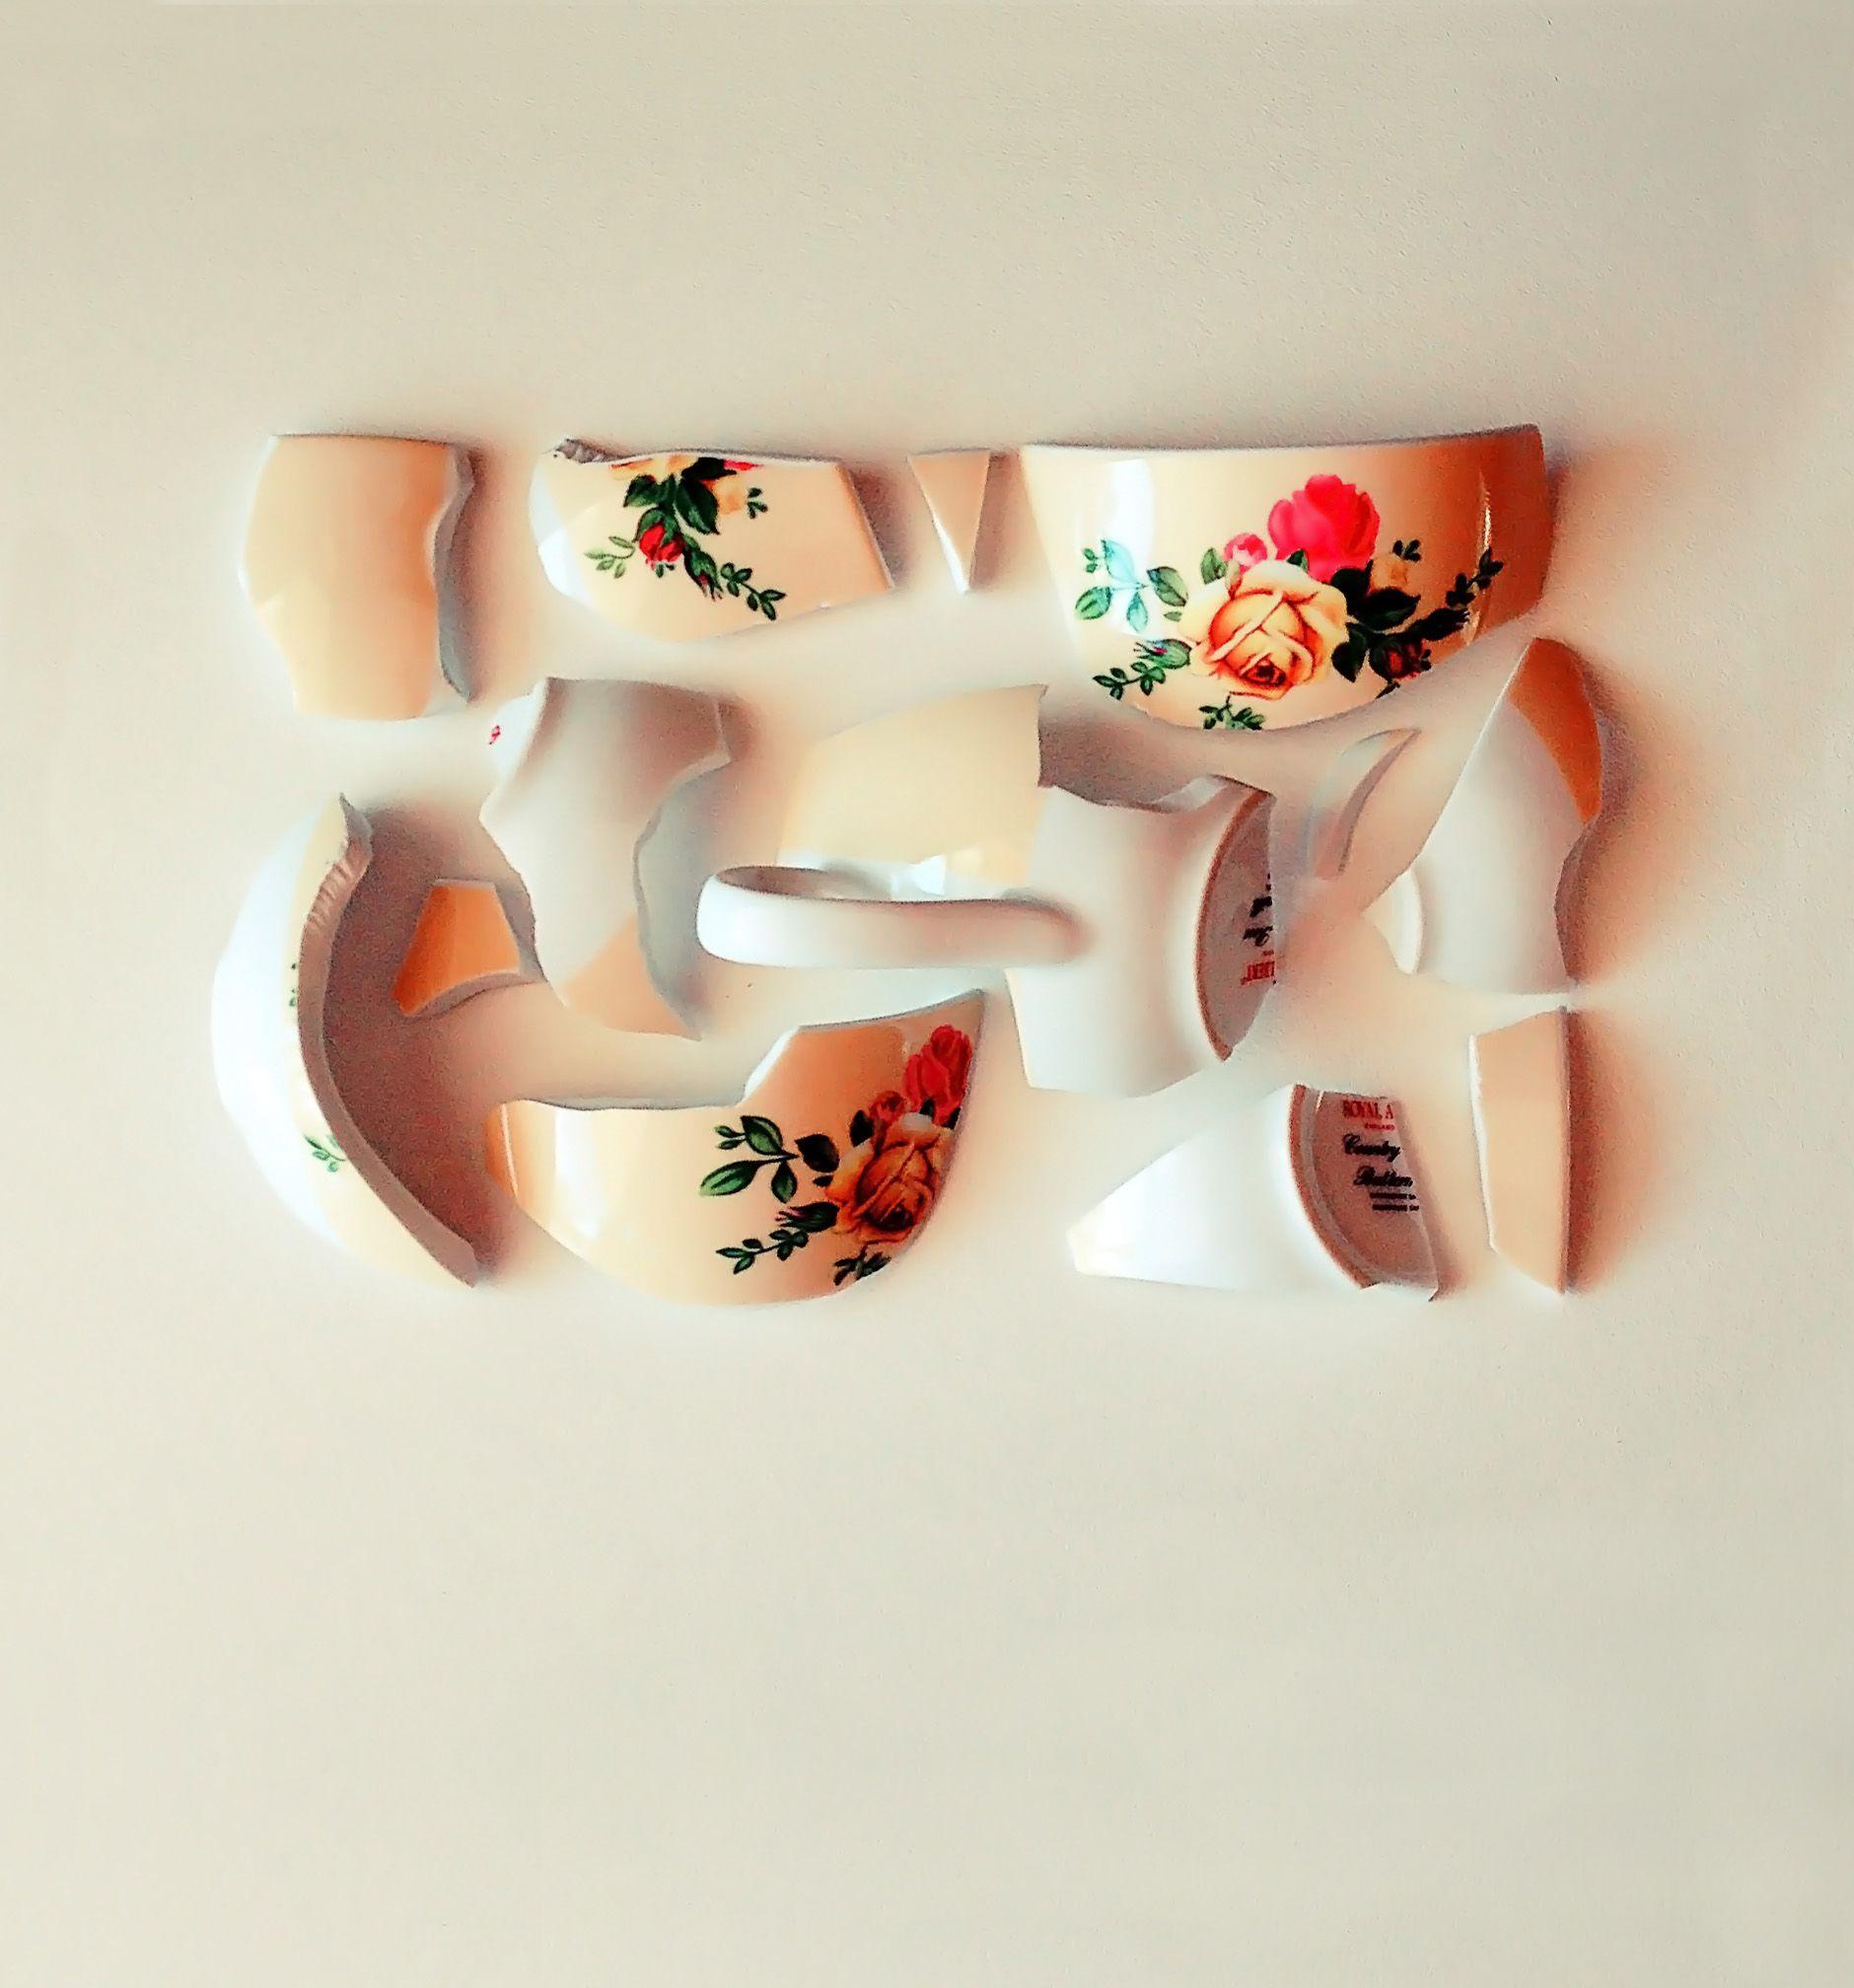 Broken tea cup arranged like a mosaic by karina sharpe